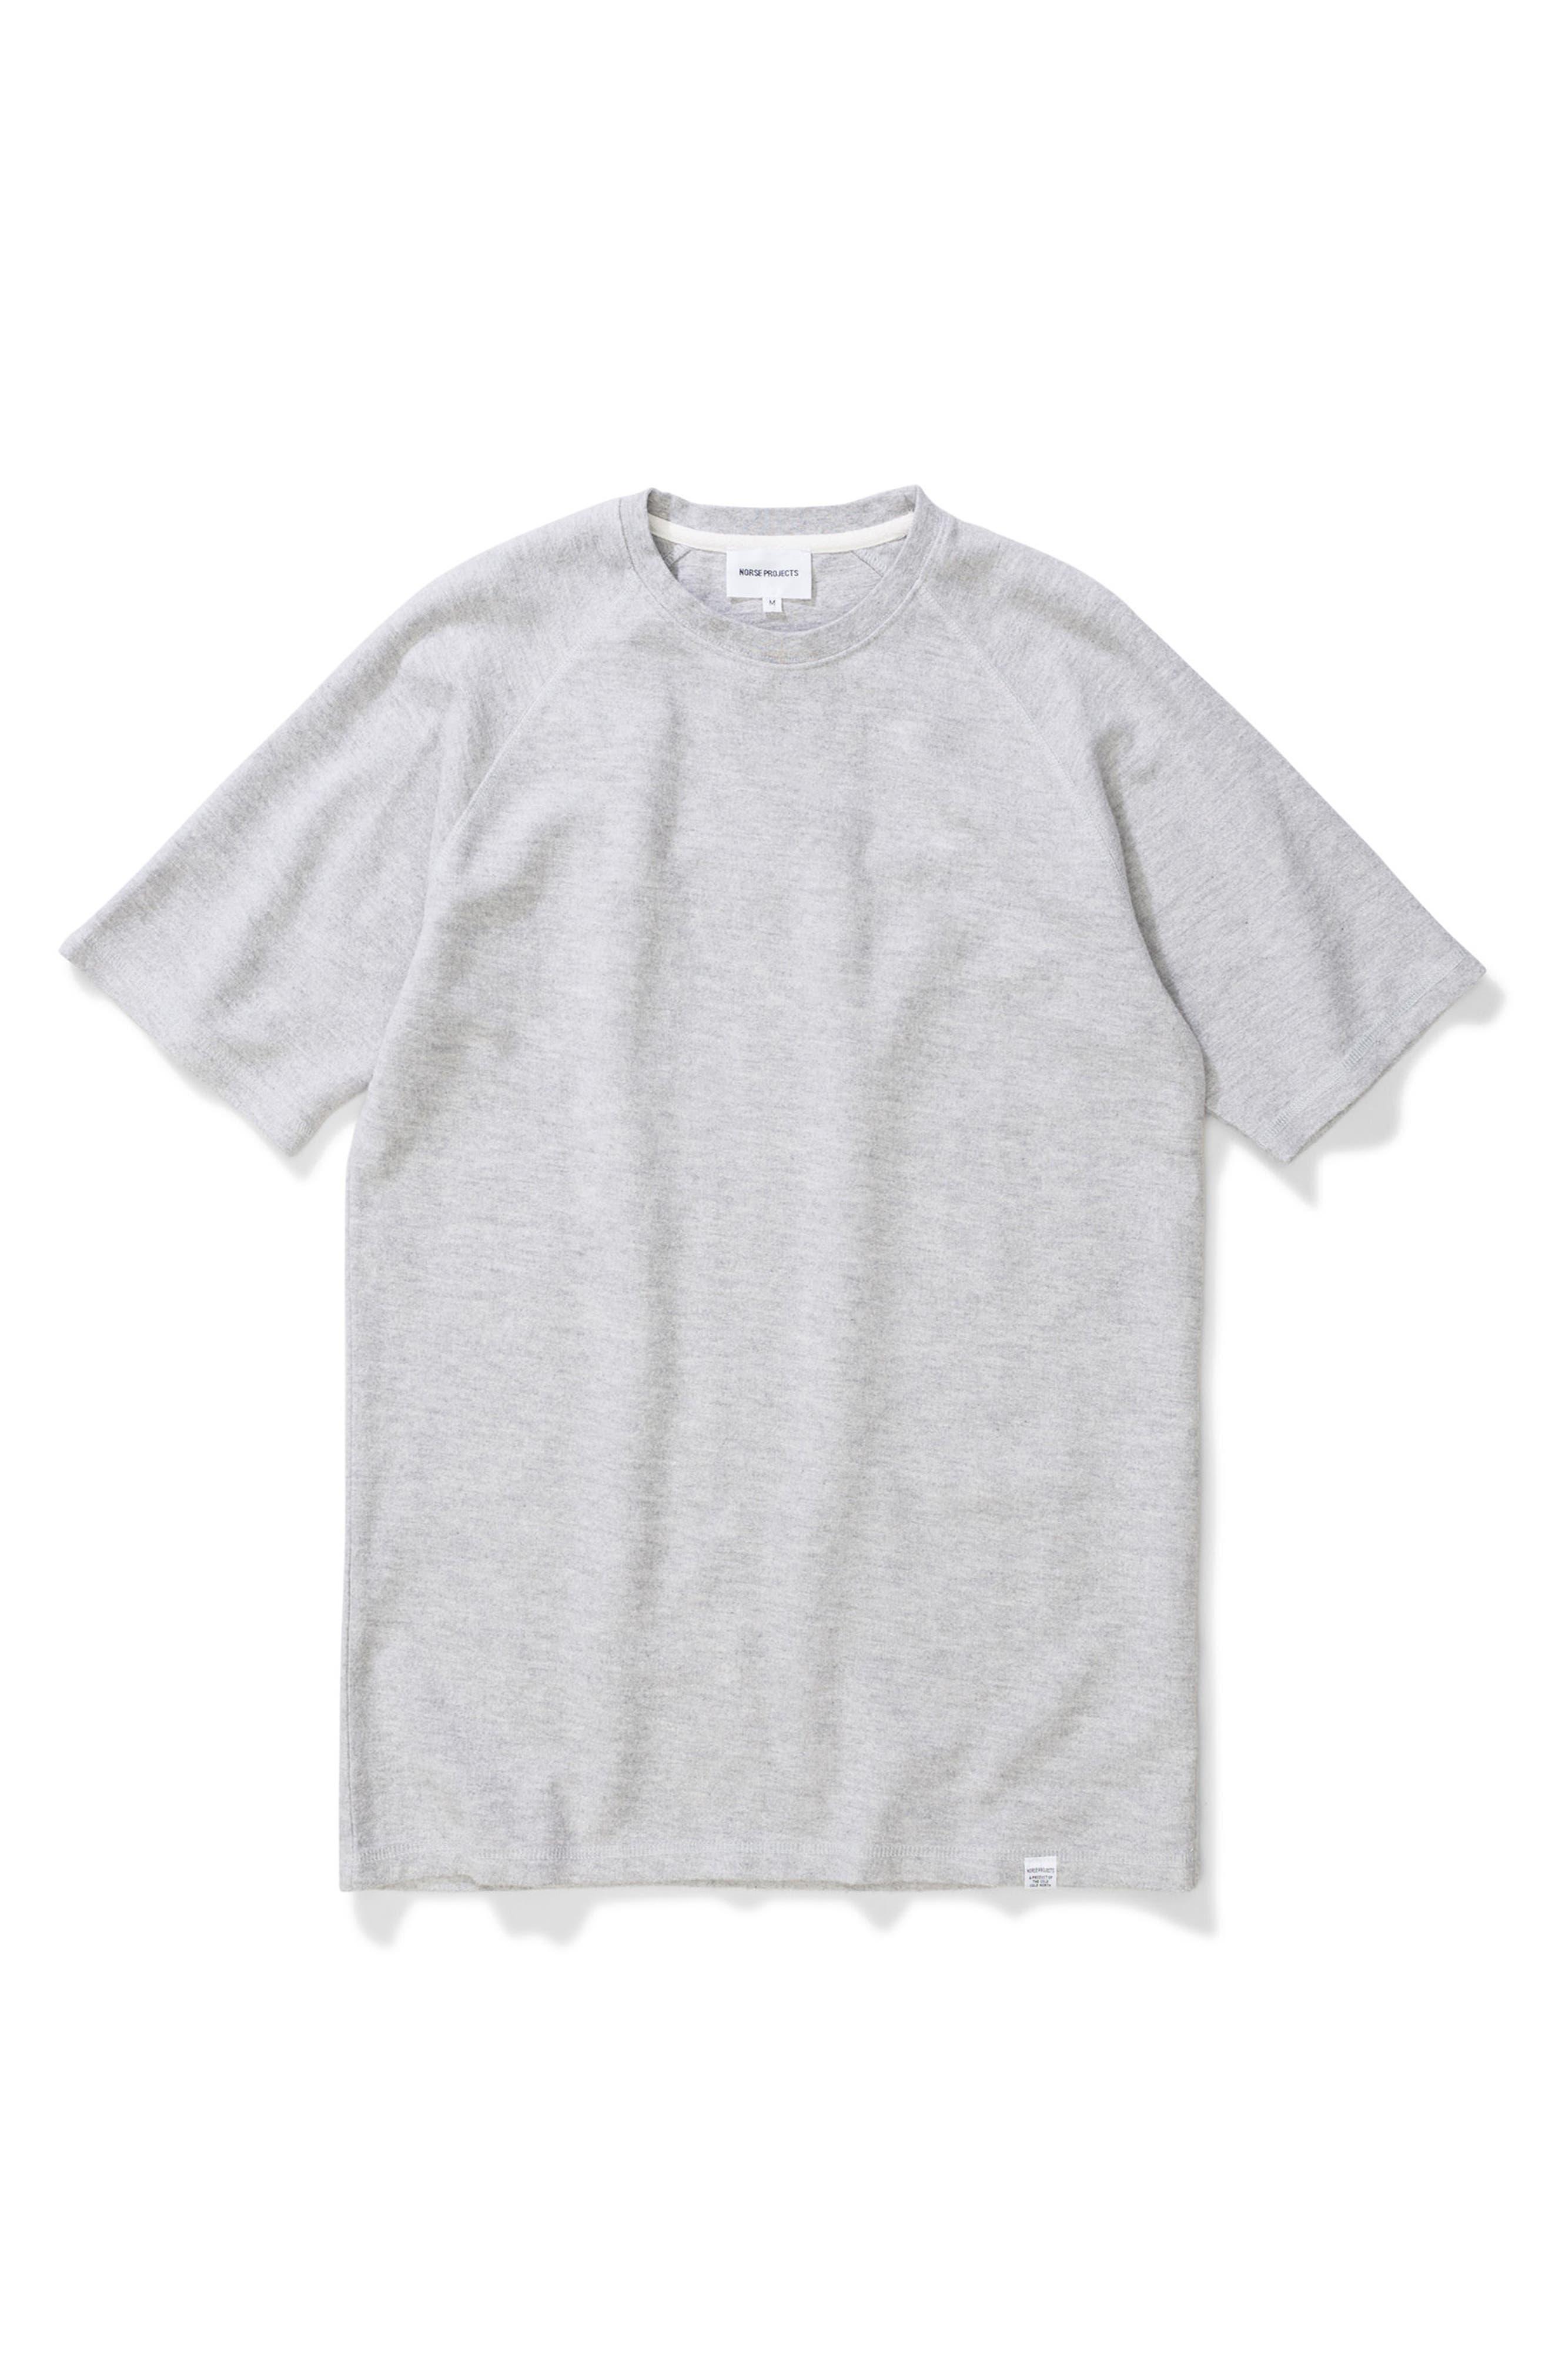 Victor Brushed Cotton T-Shirt,                             Alternate thumbnail 9, color,                             050